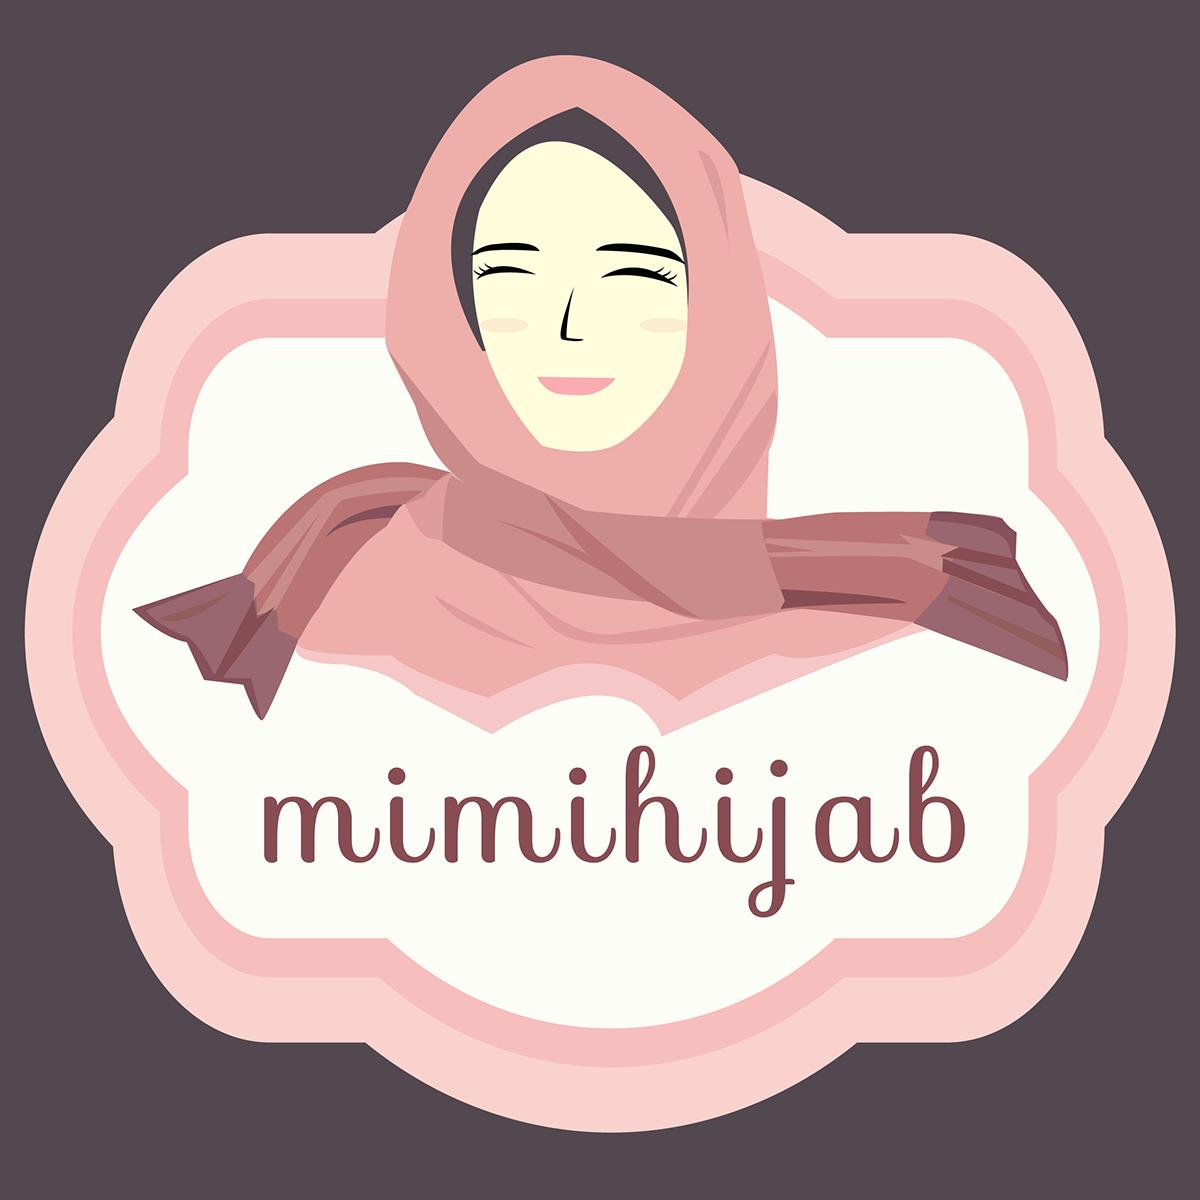 Mimihijab S Logo On Behance Aurora Sleeping Beauty Logos Movie Posters